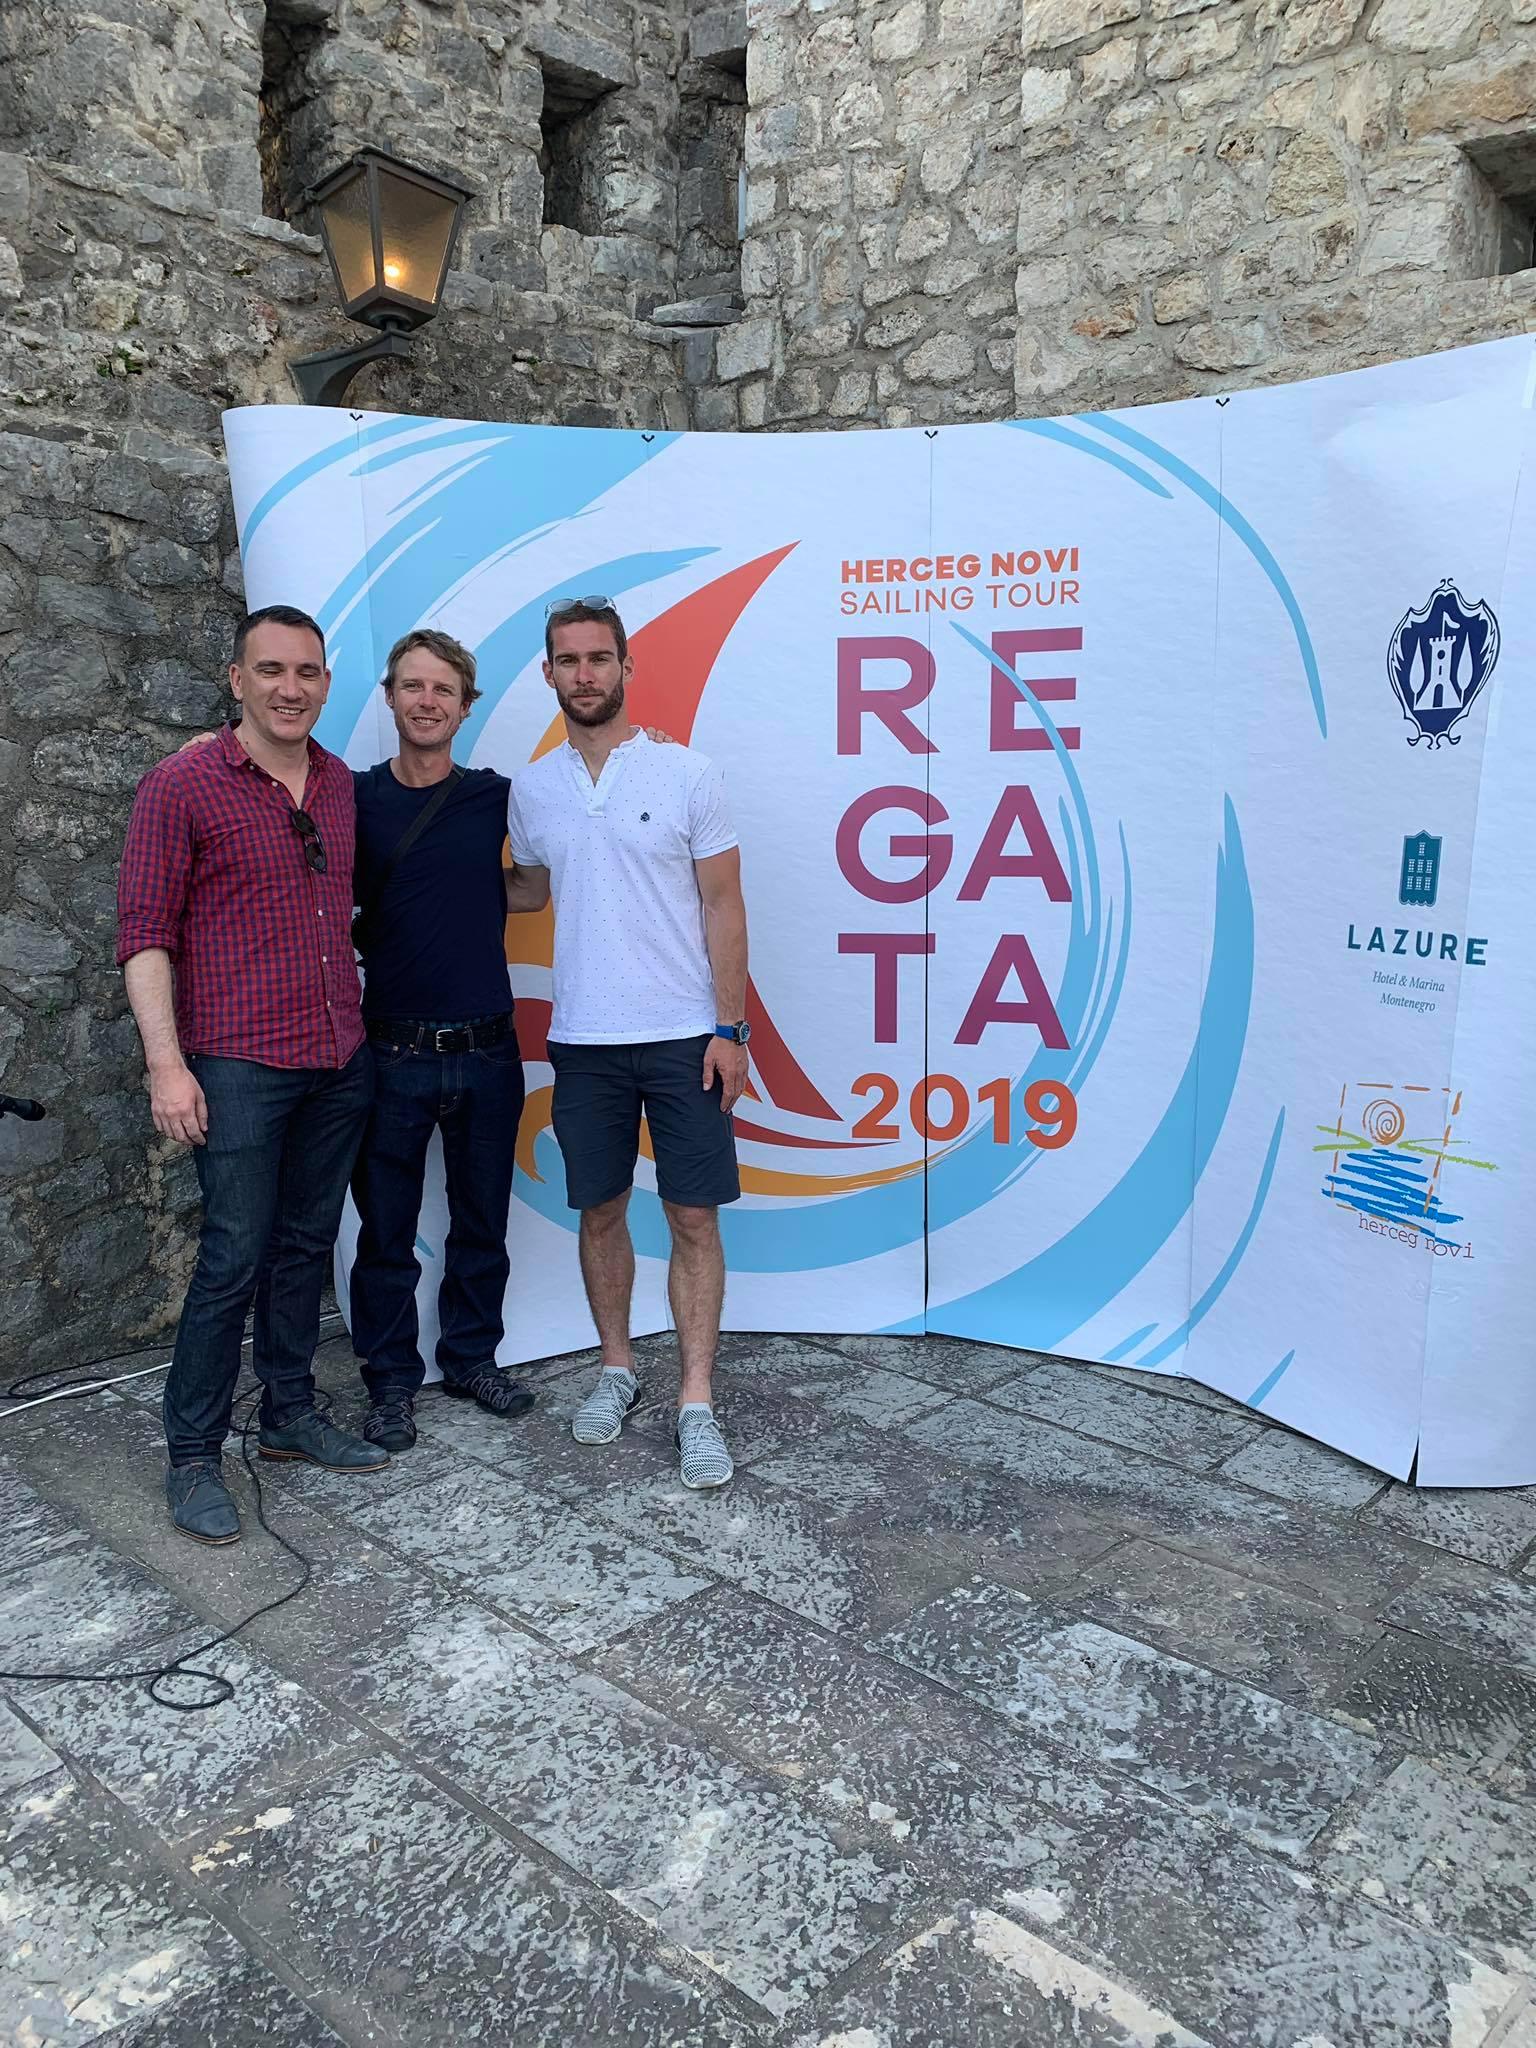 Expat Life in Montenegro Day 2 First full day in Herceg Novi17.jpg